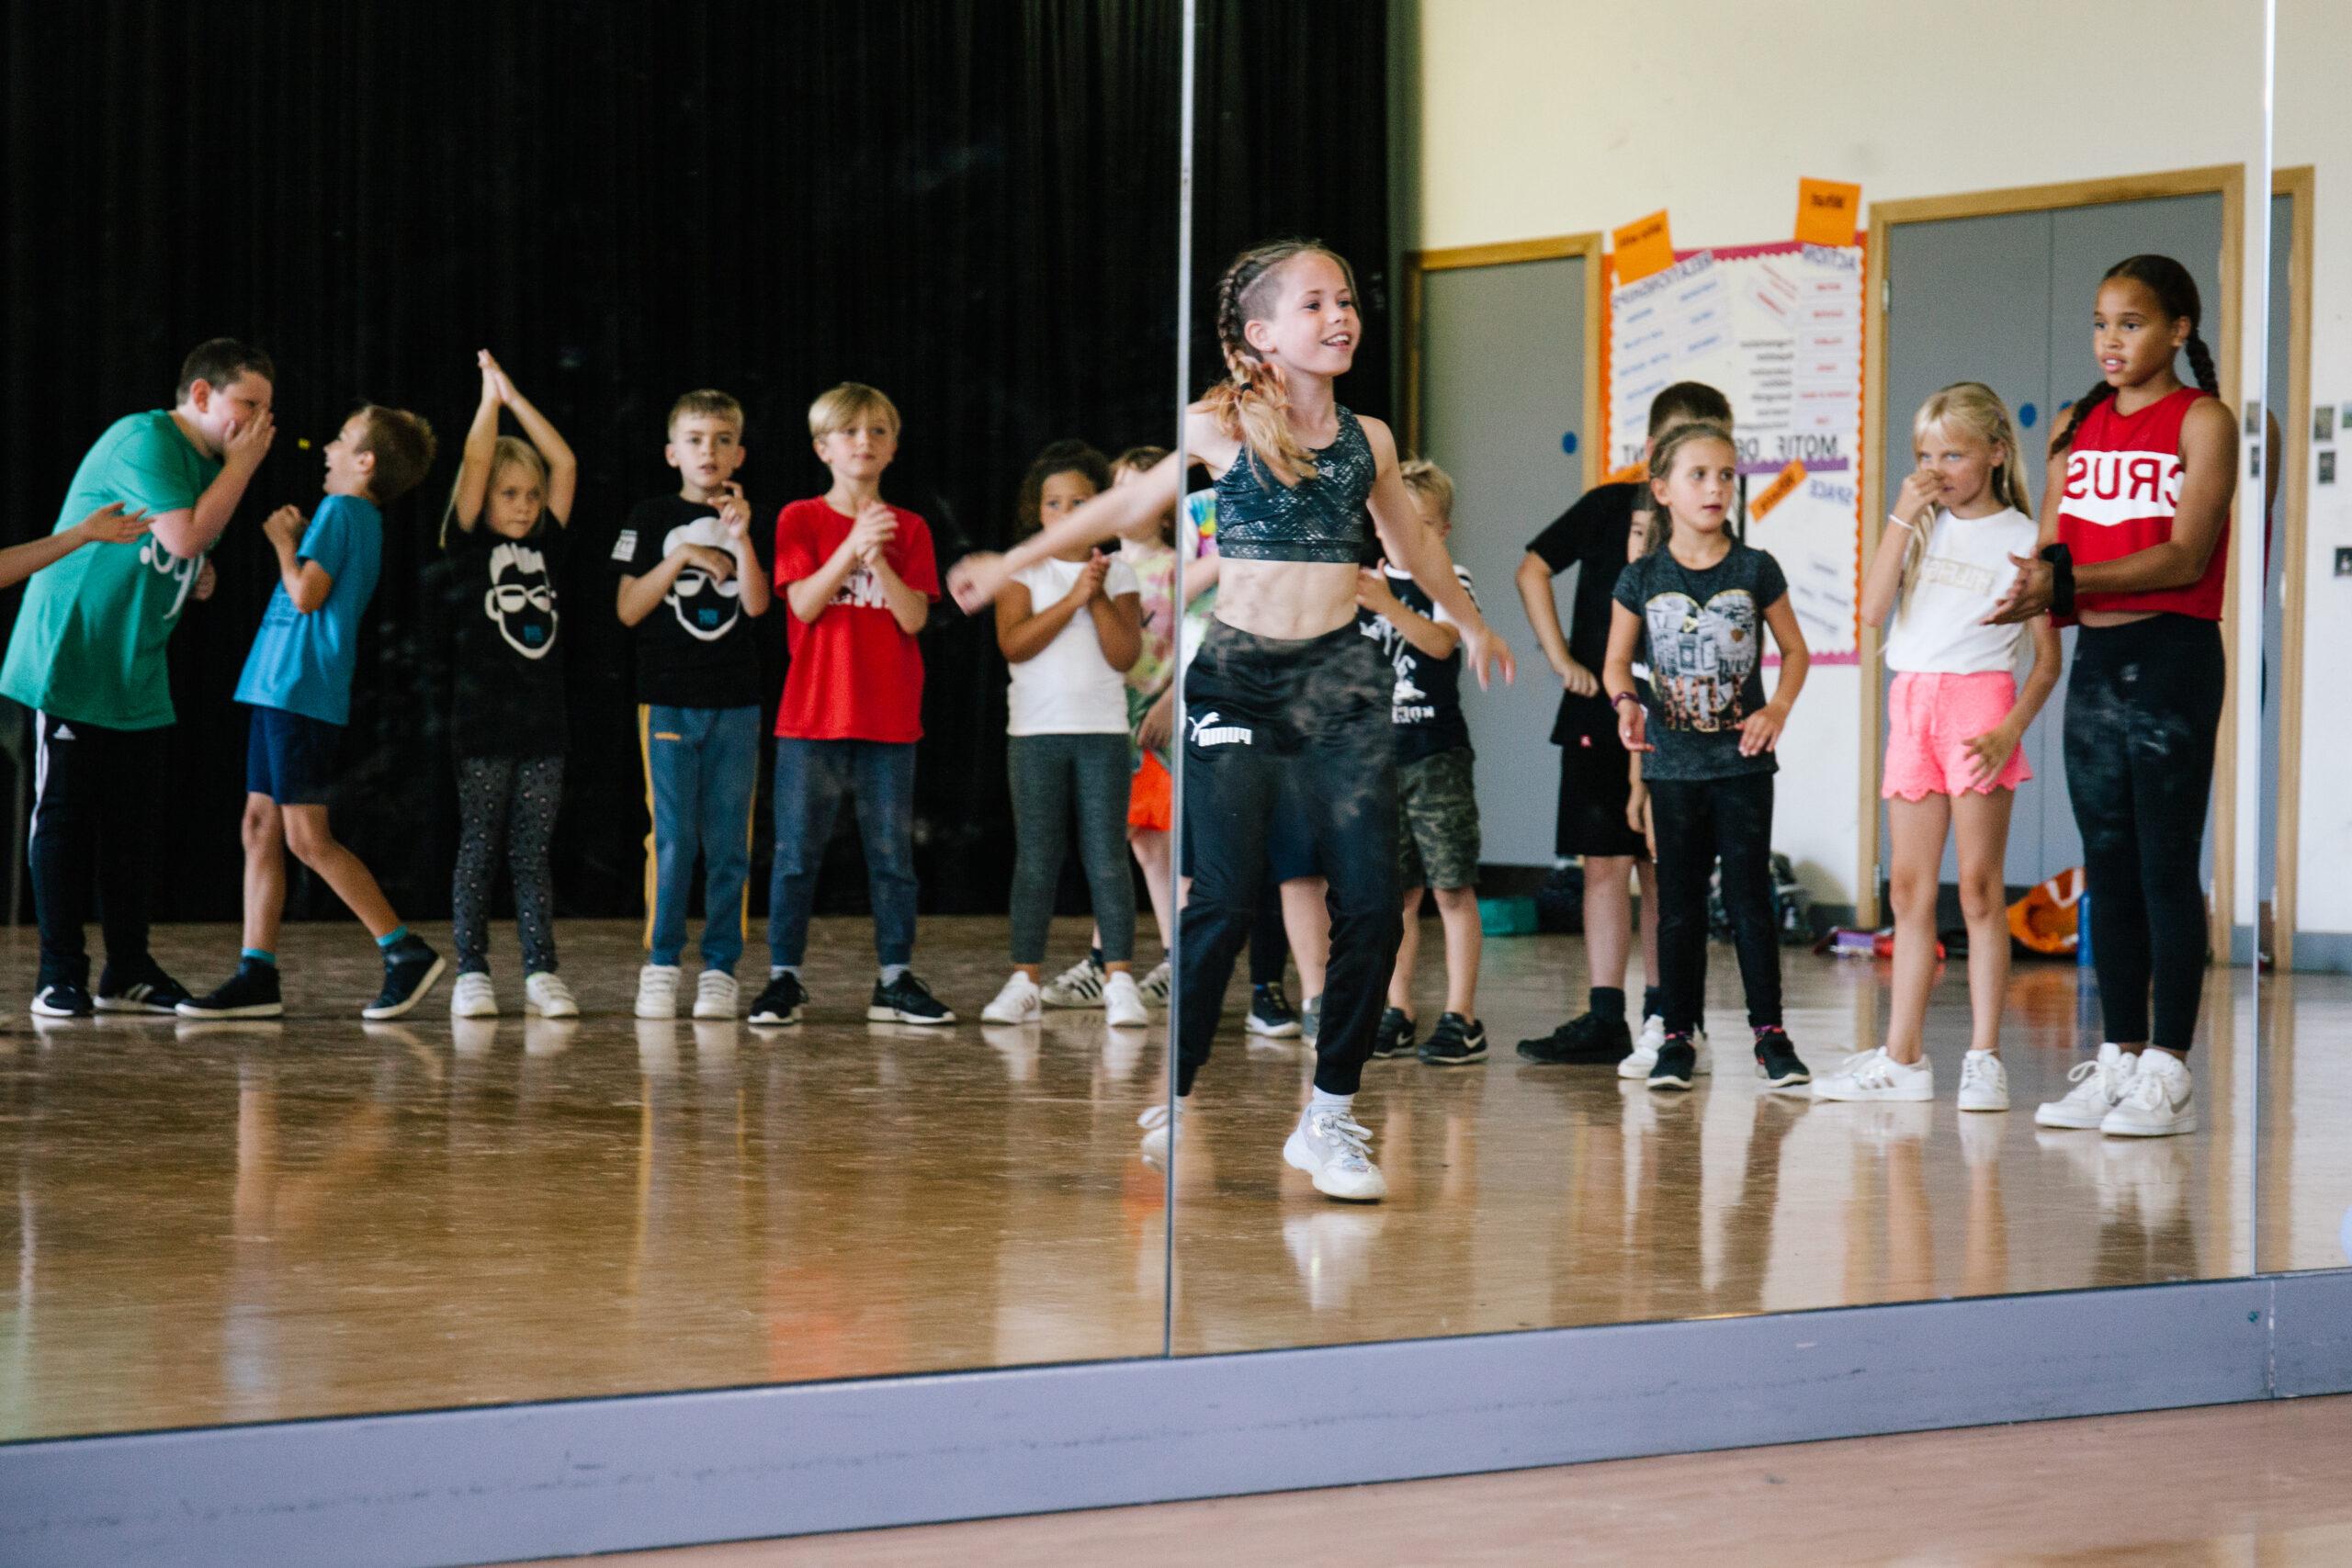 East Grinstead Street Dance School